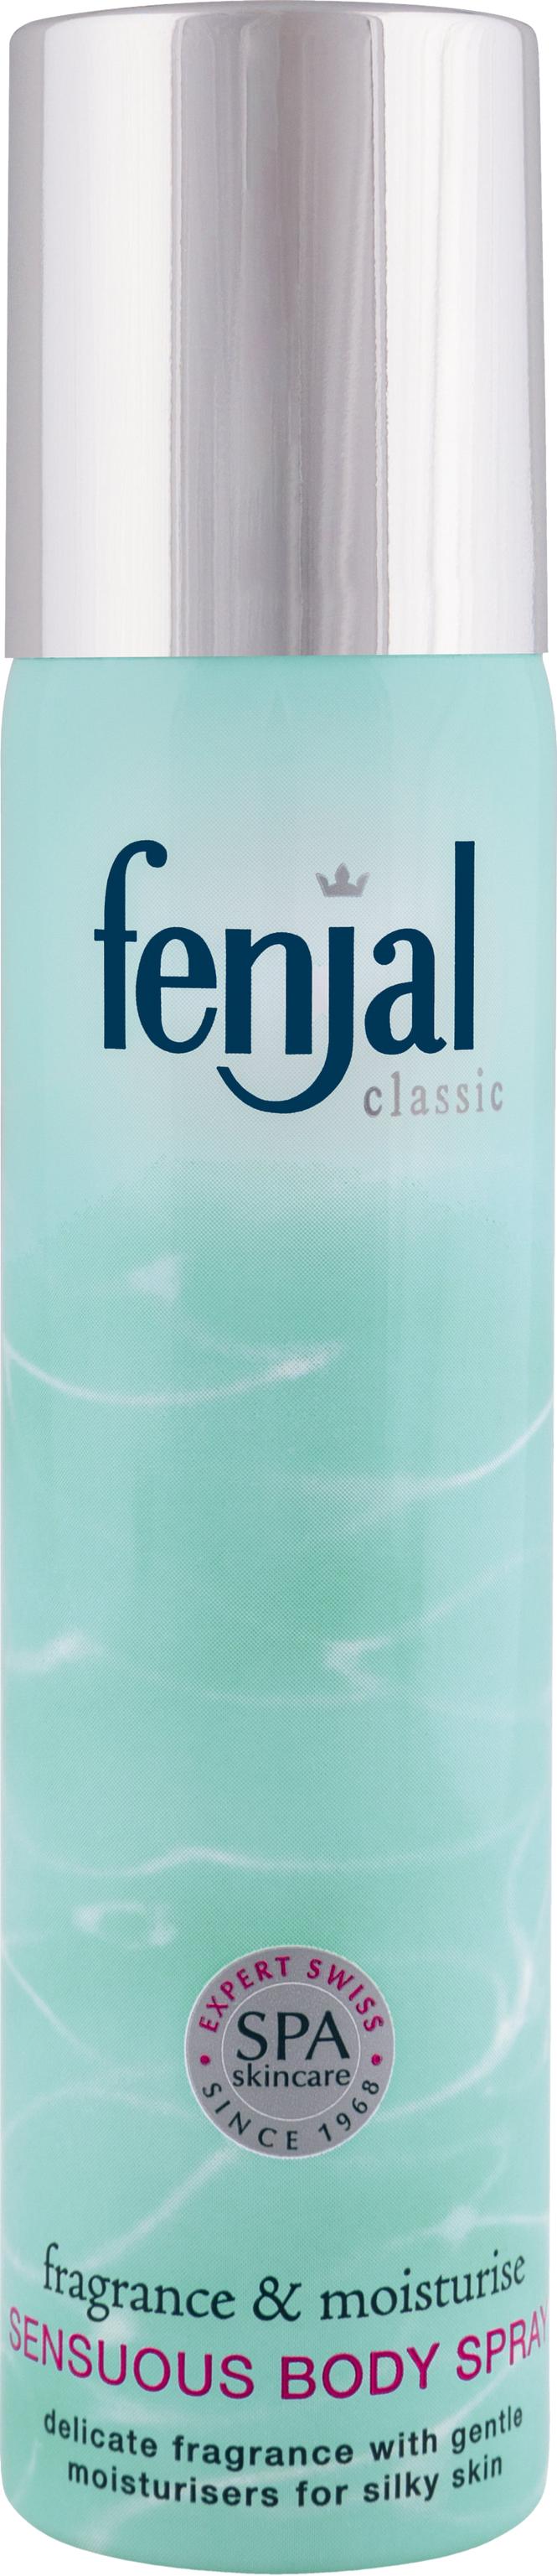 Fenjal Eau De Toilette Spray 75 ml